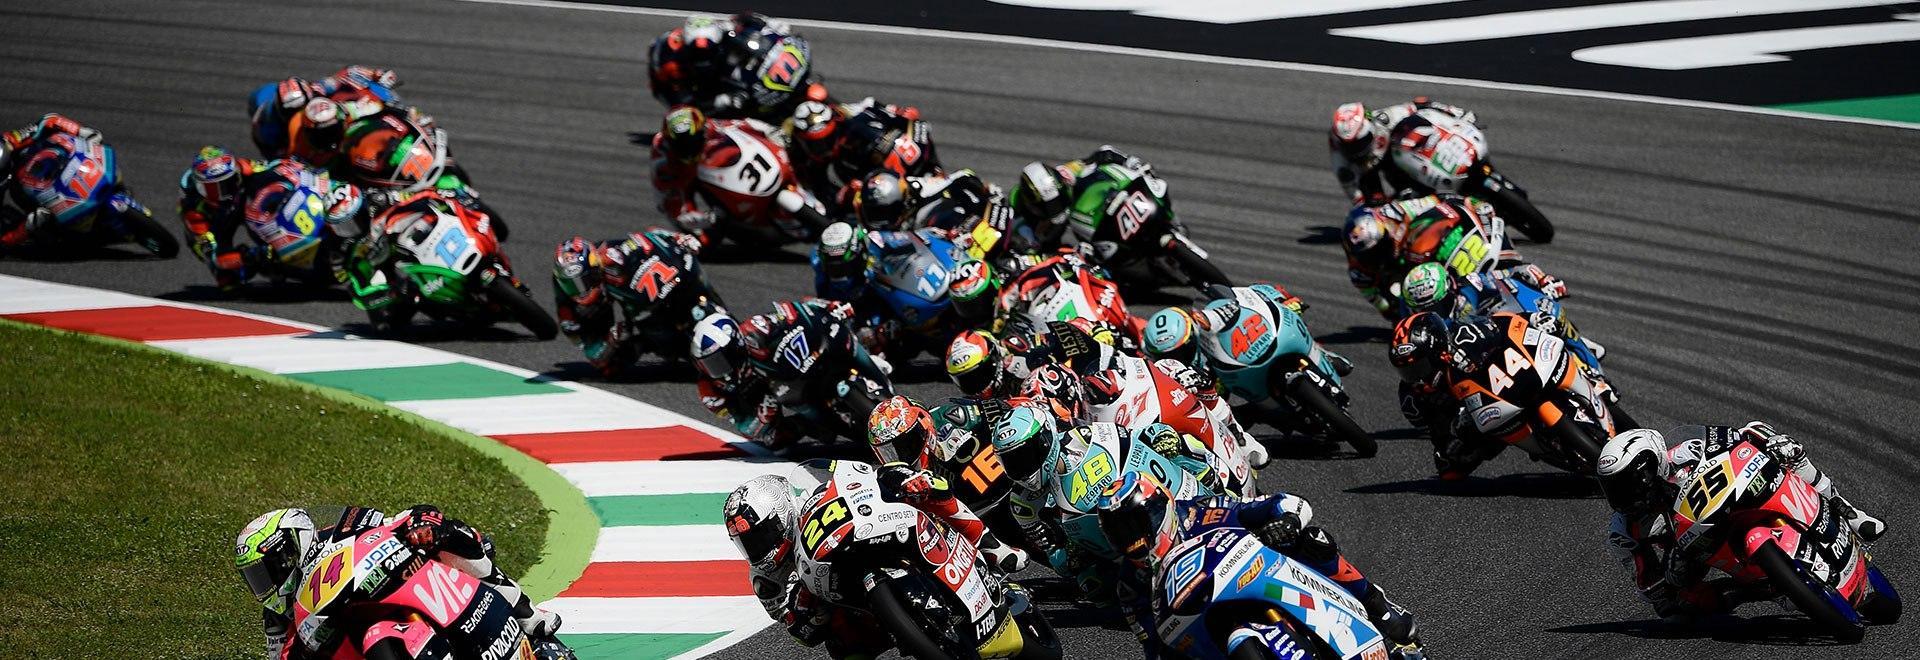 Supersport Imola. Race 1